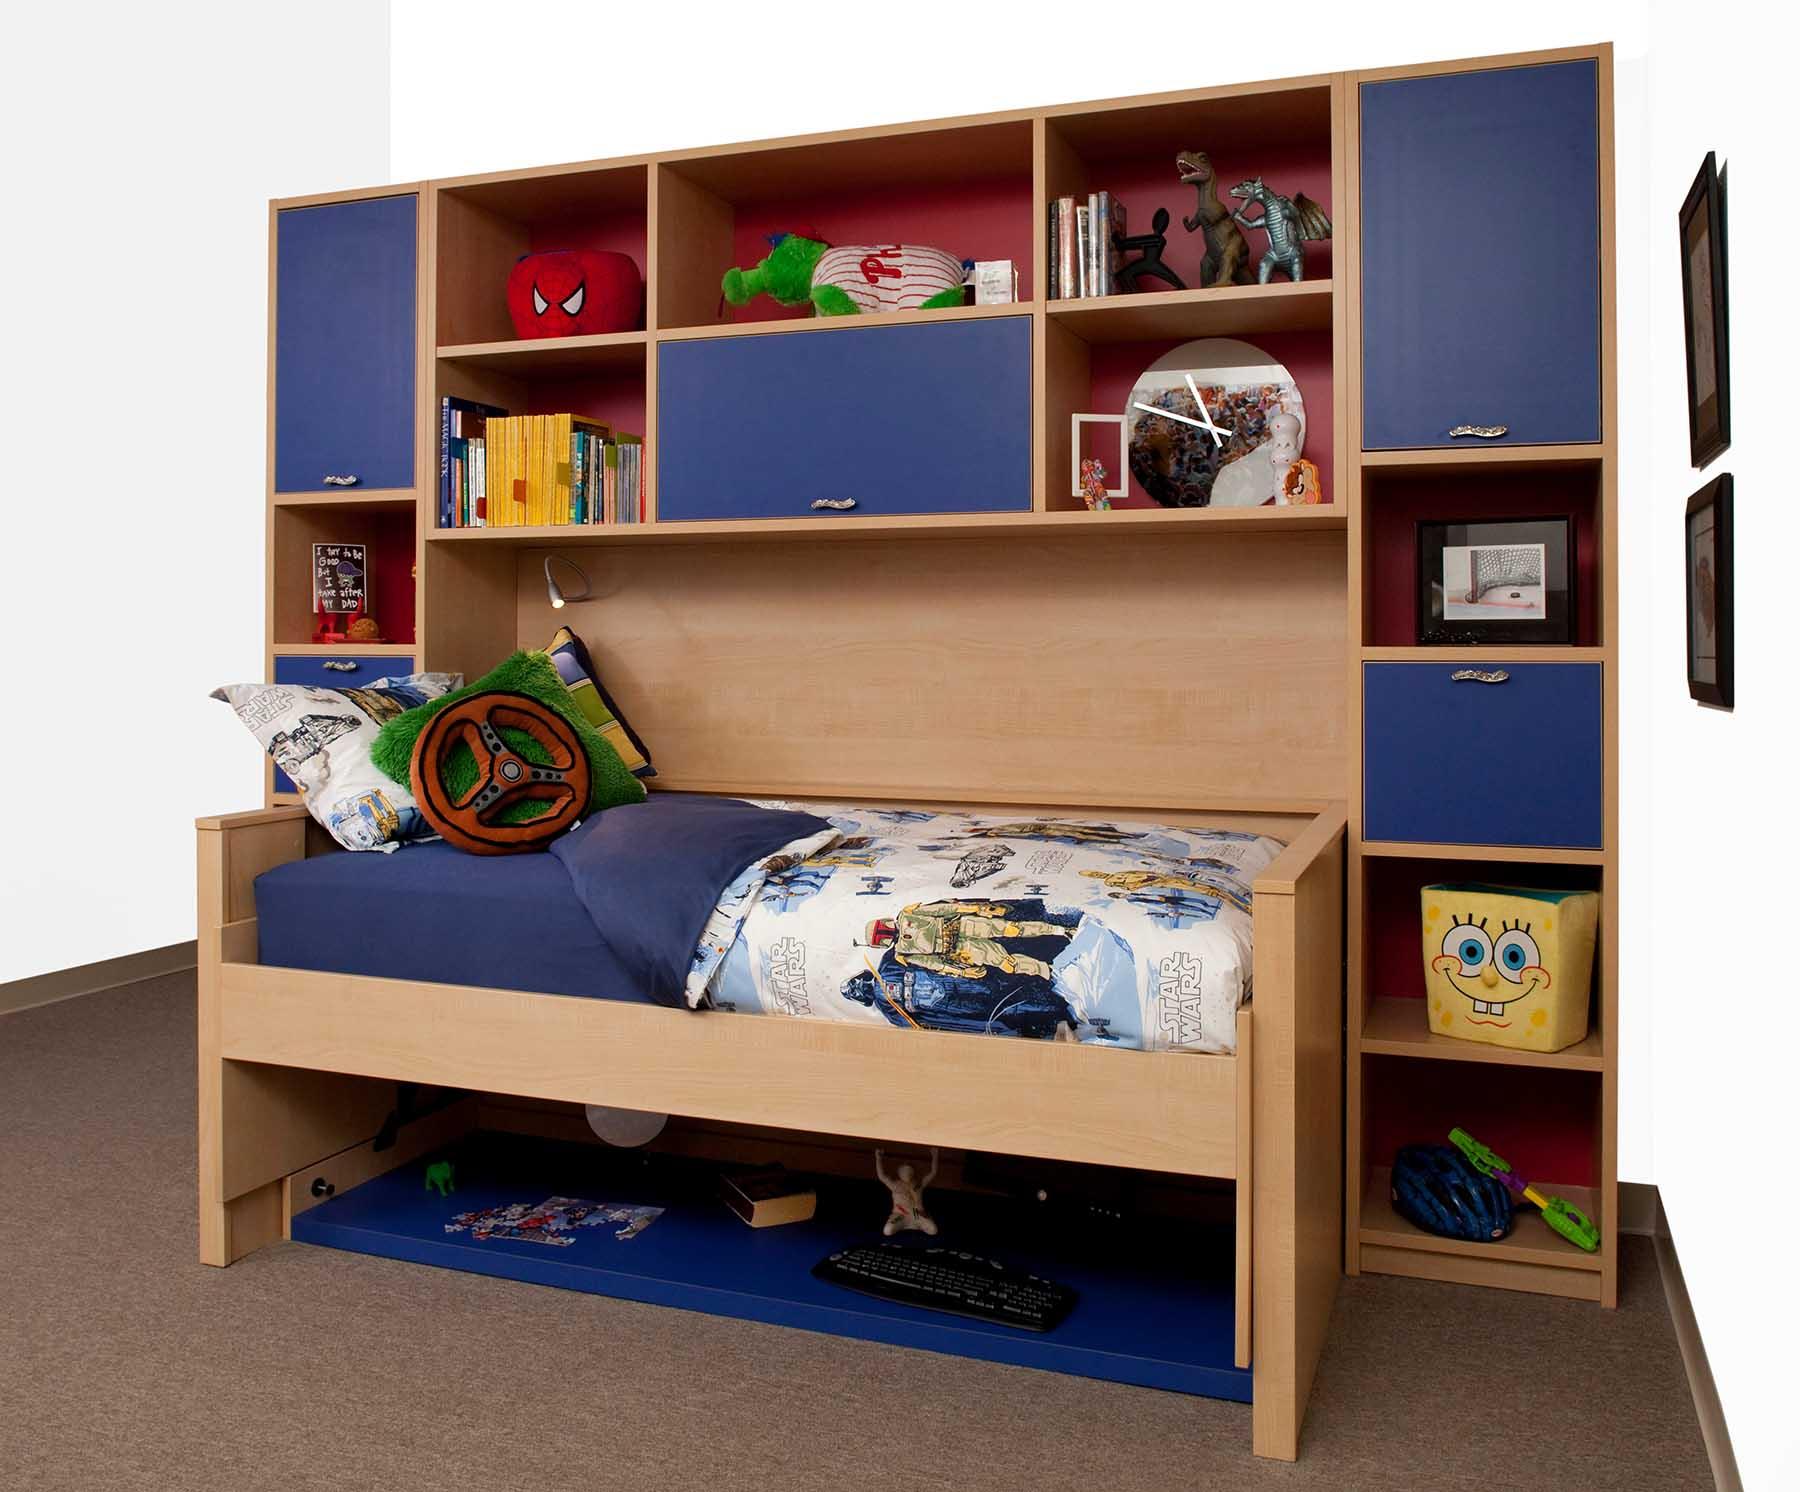 Space saving hidden bed